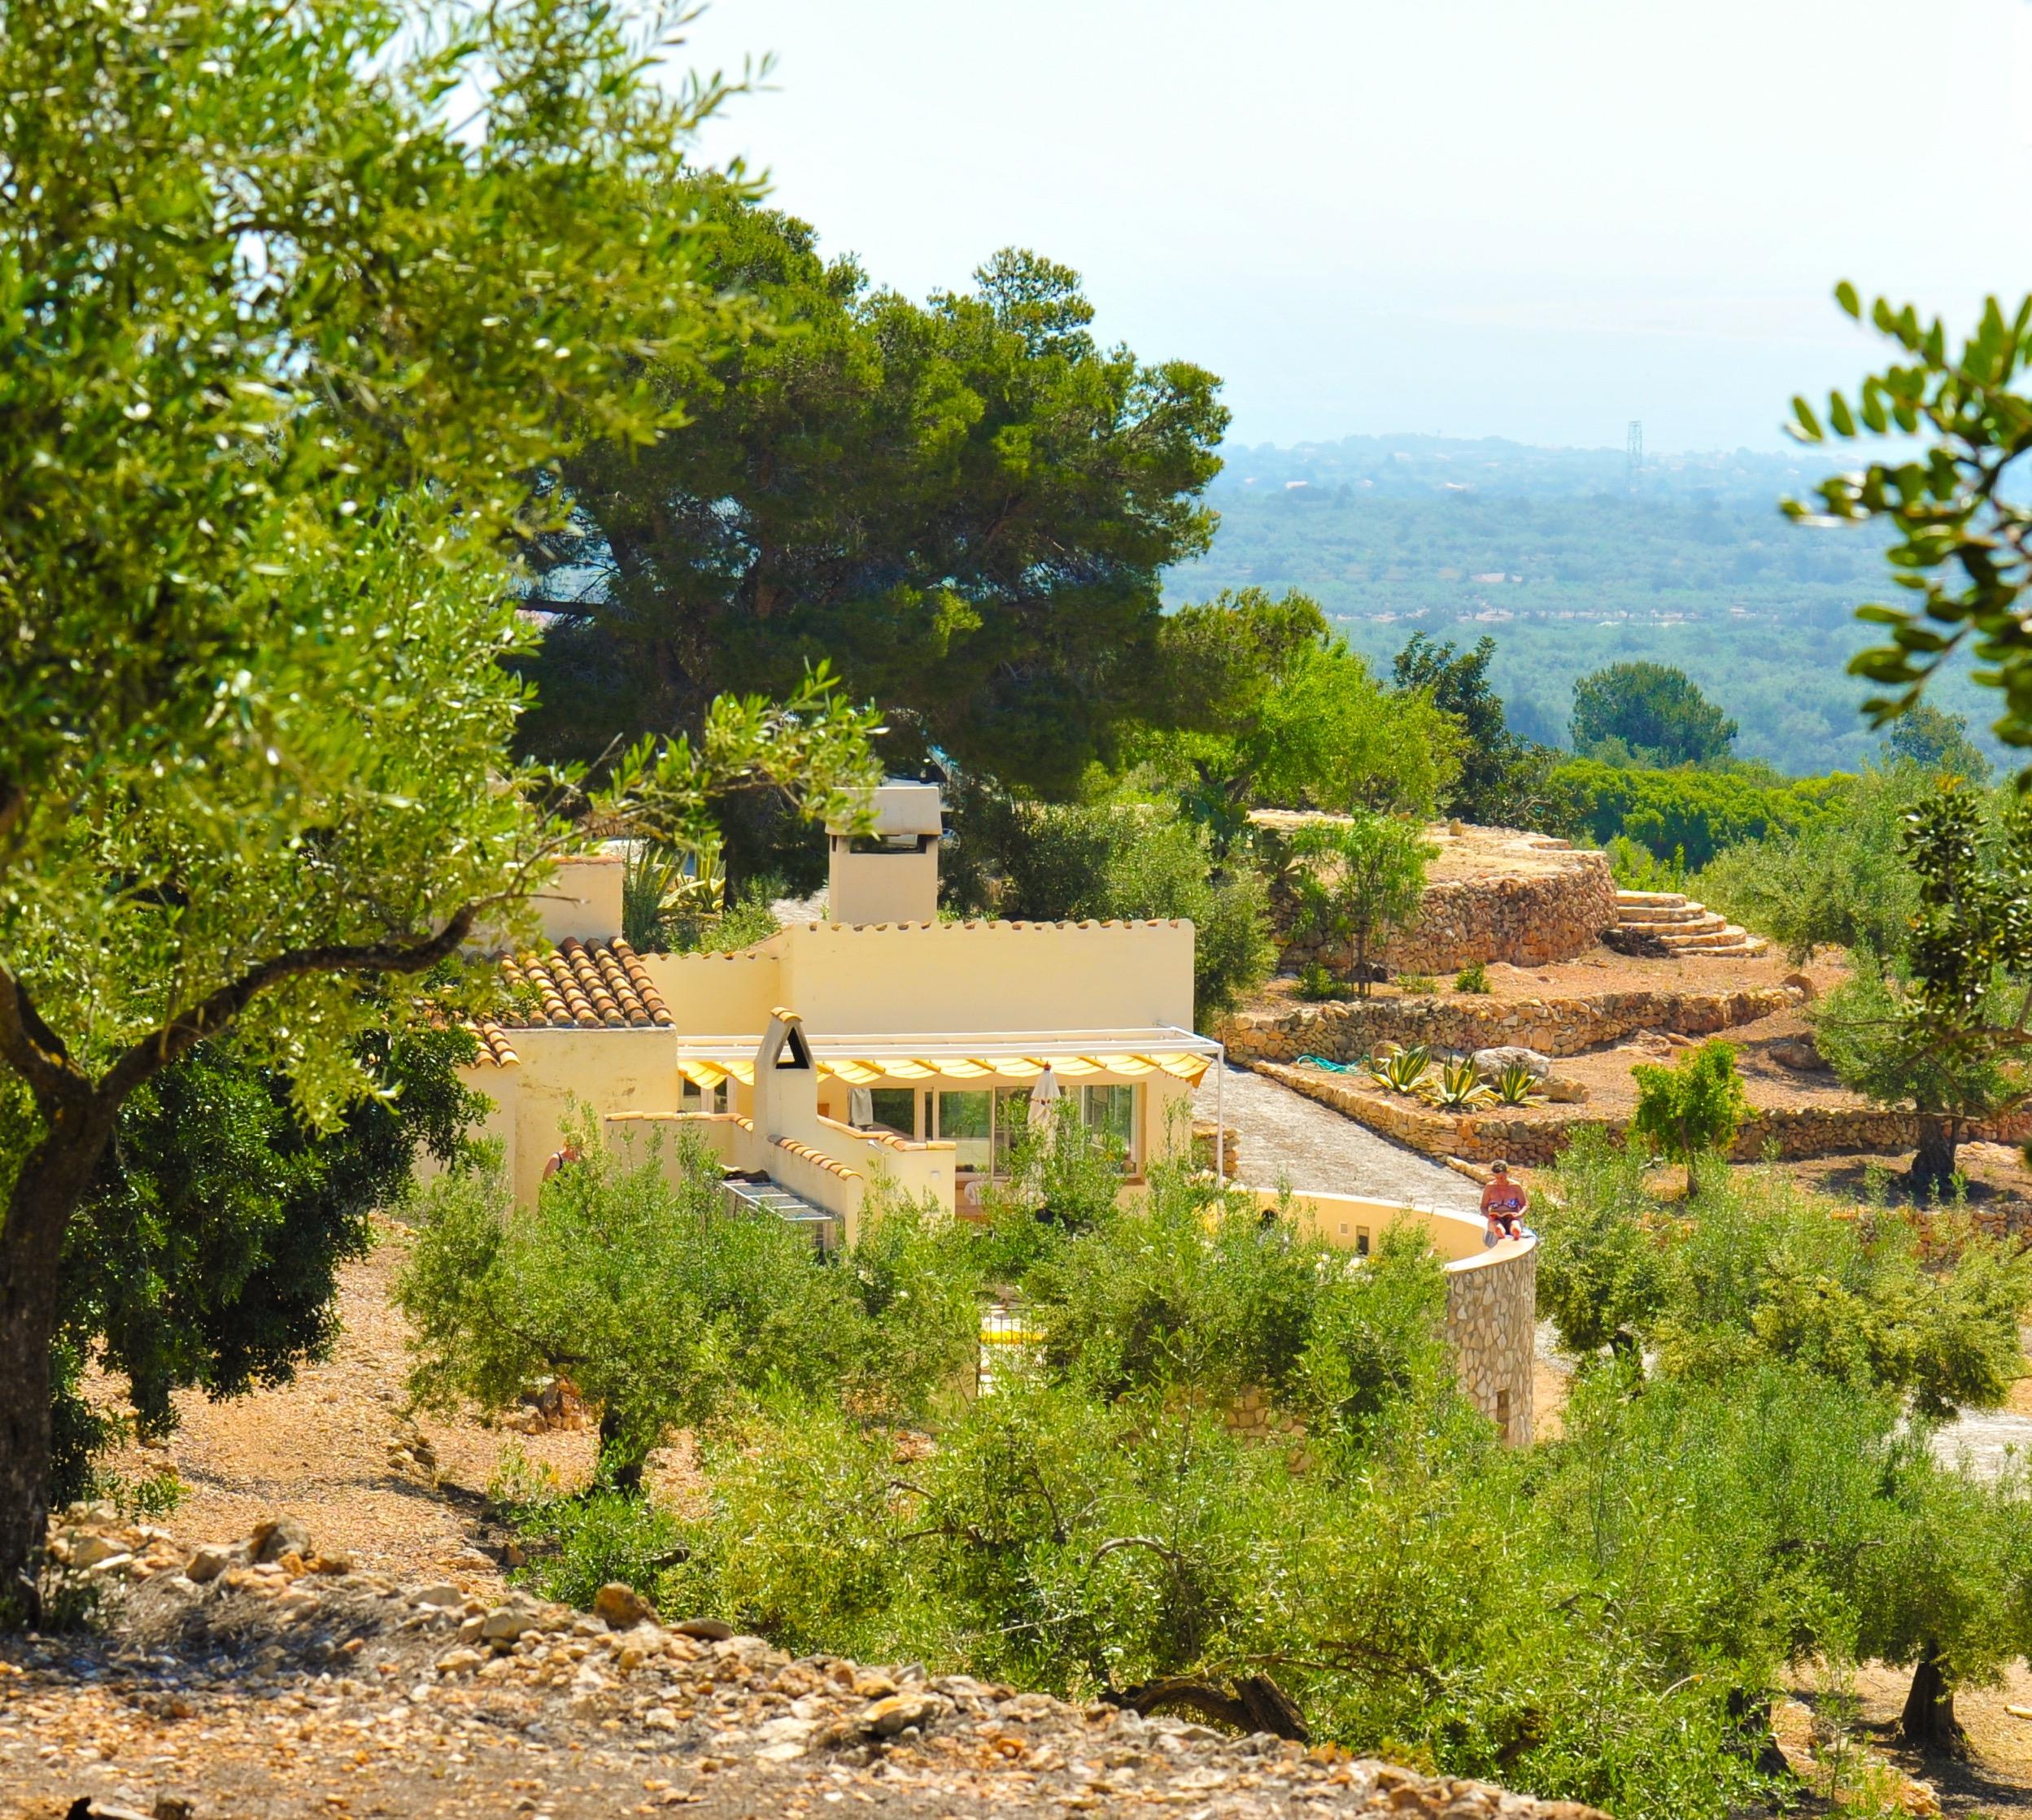 Spanien Urlaub 2010  (88).jpg